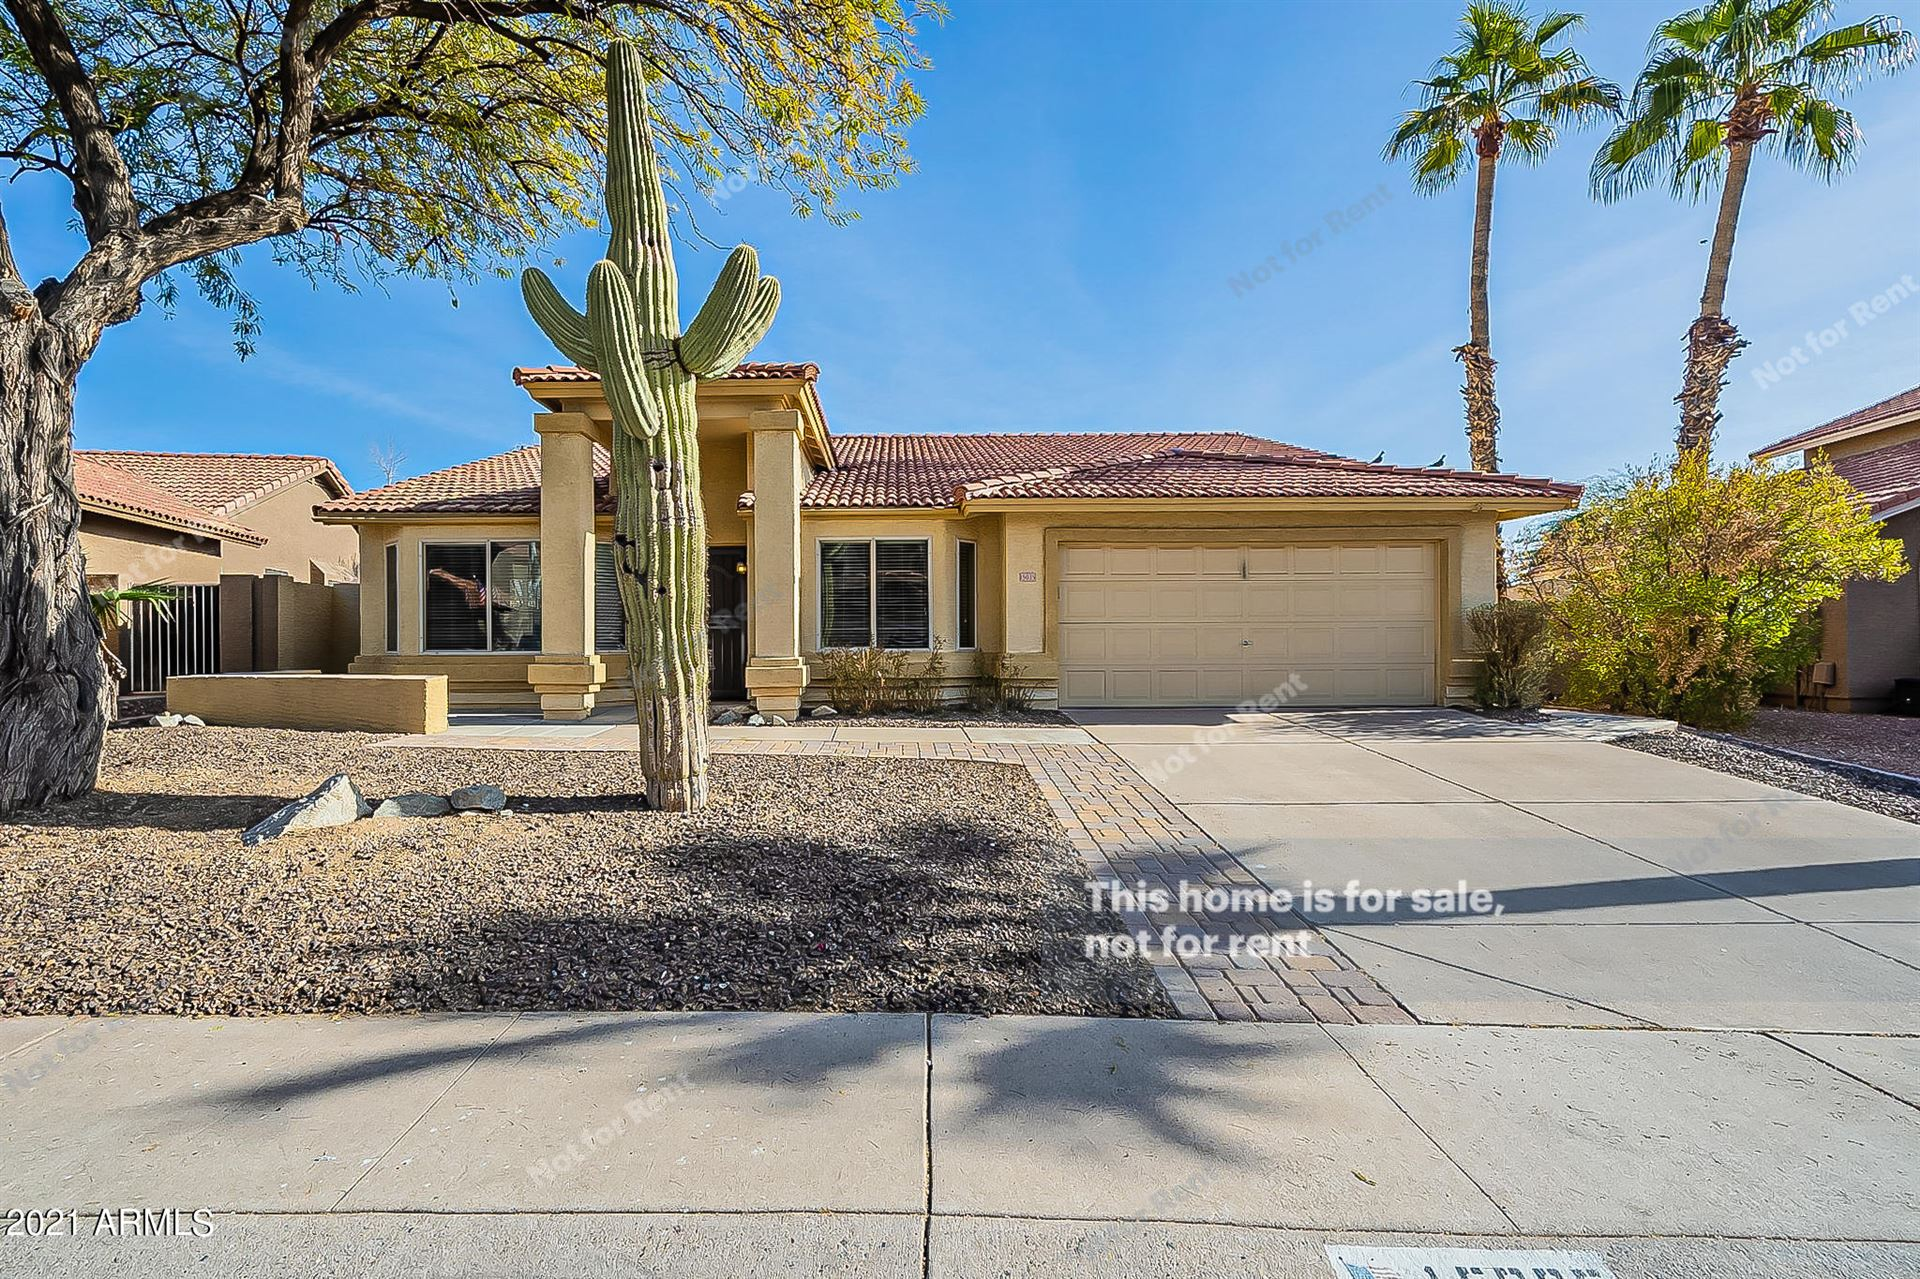 15035 S 28TH Street, Phoenix, AZ 85048 - MLS#: 6181719